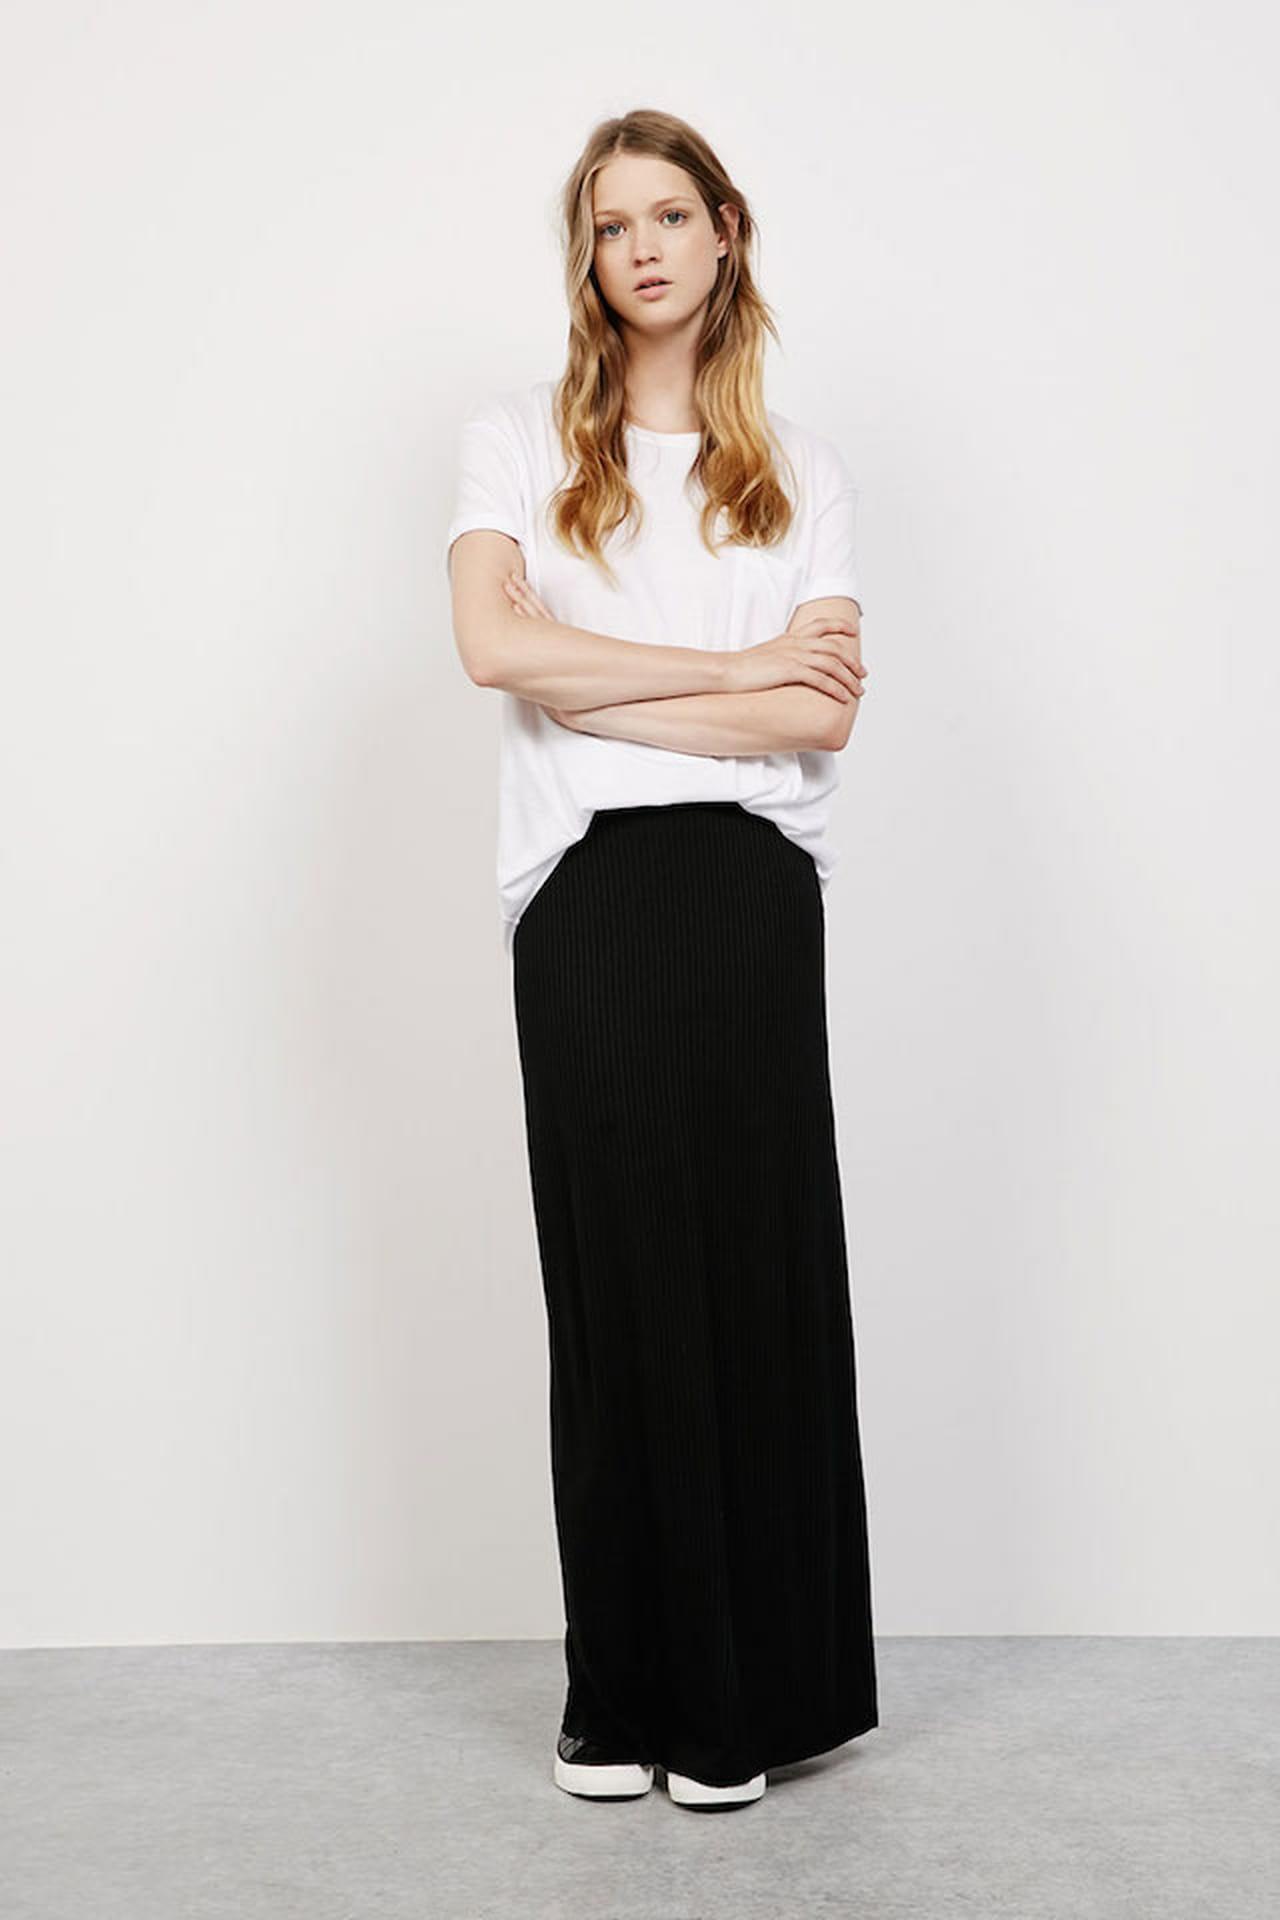 Connu Outfit gonna lunga: consigli per non sbagliare DM81